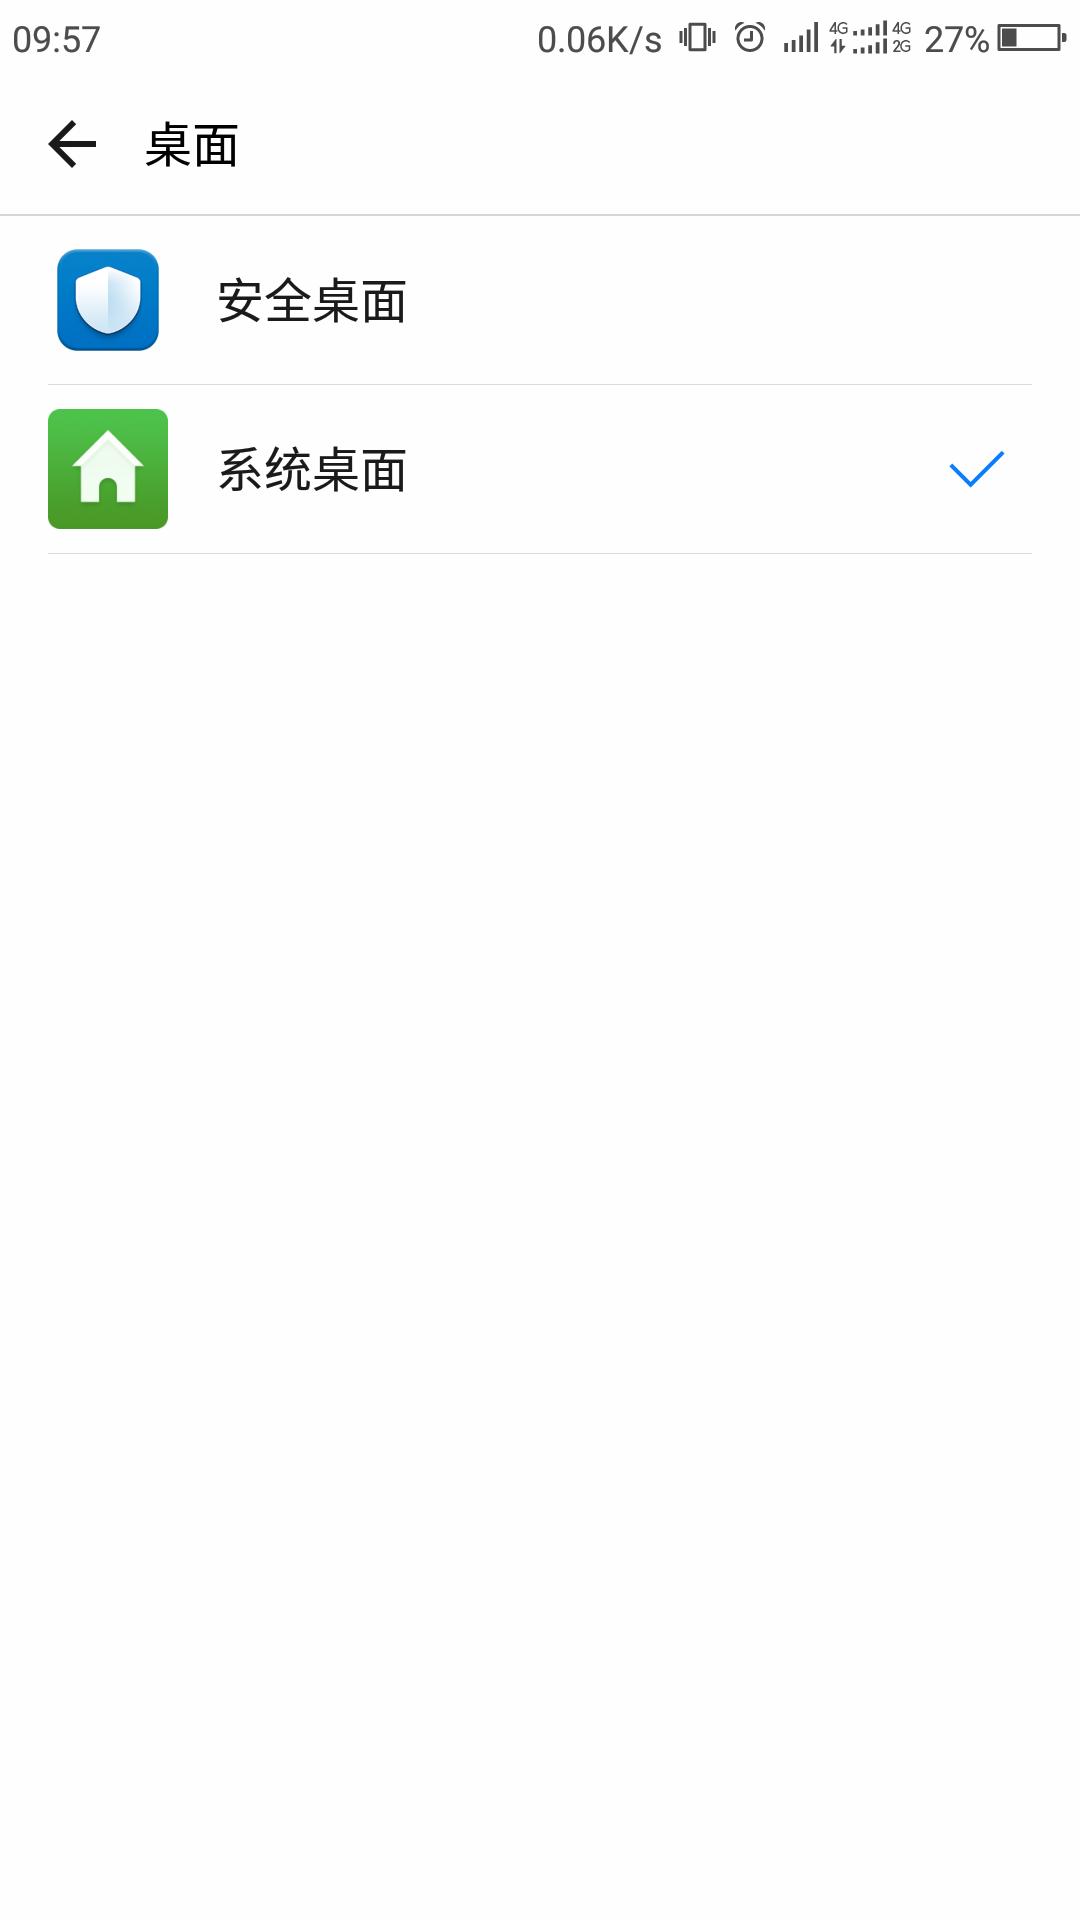 Screenshot_2019-01-02-09-57-30.png